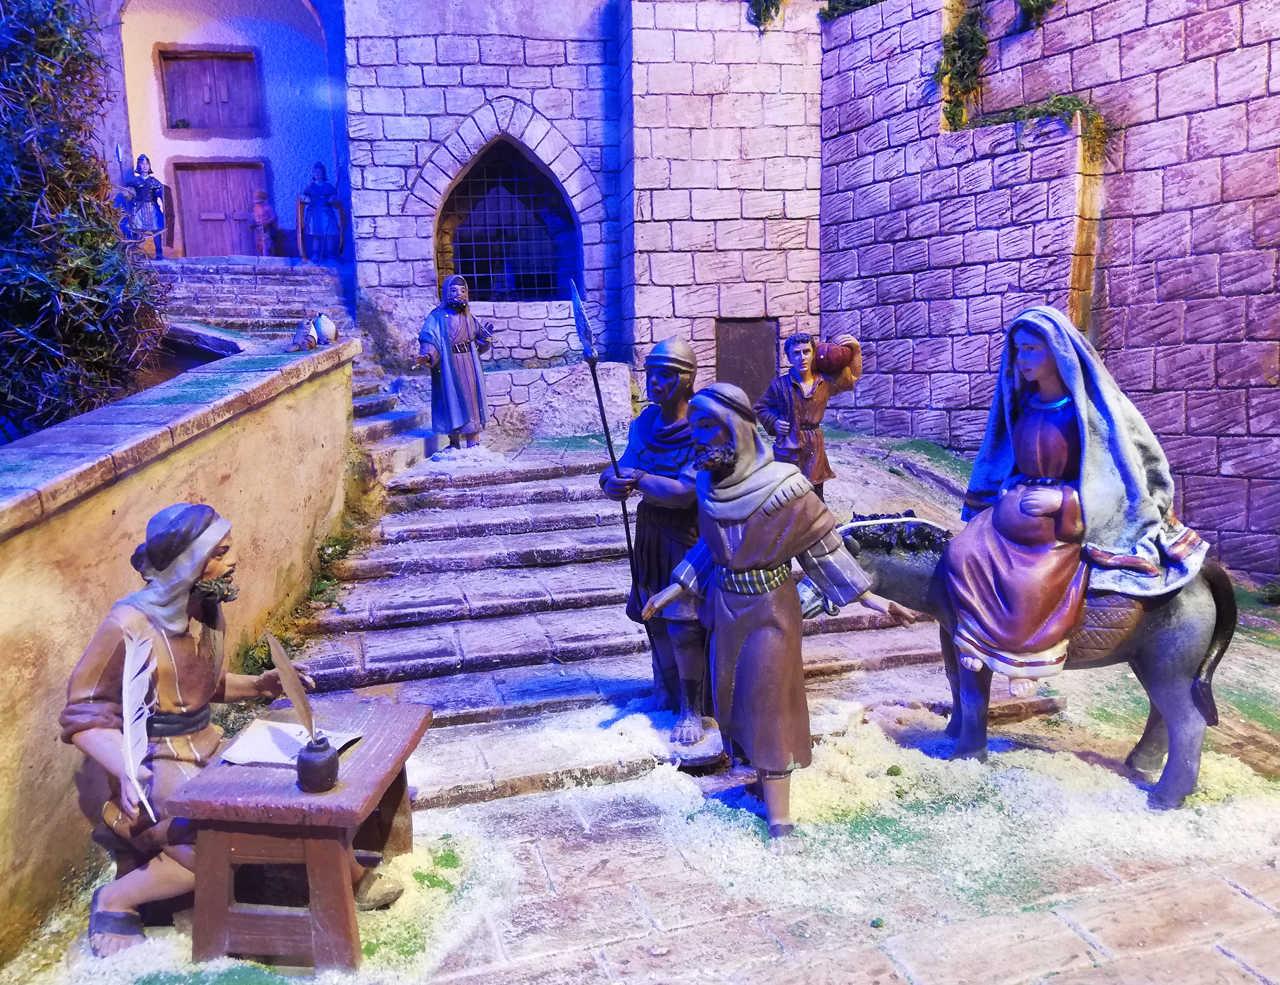 Museu de betlems i diorames d'Albaida